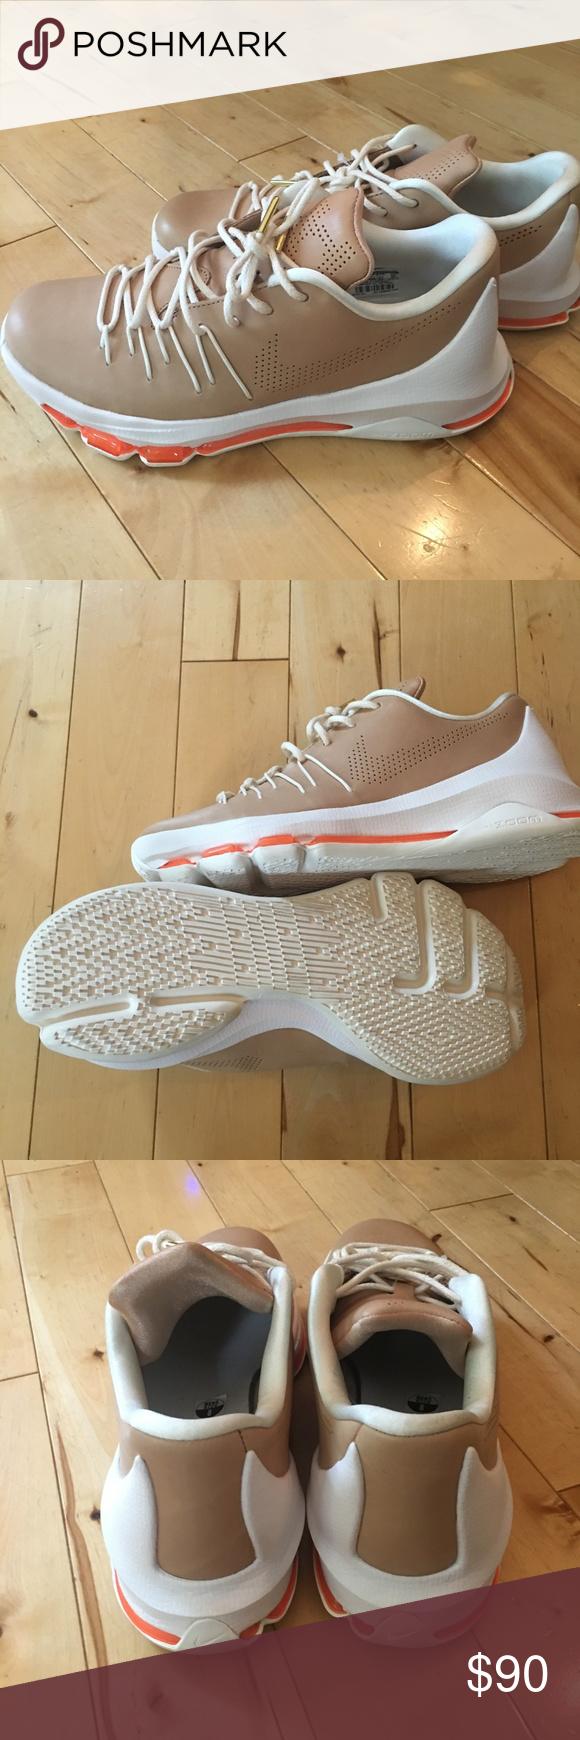 341d508b5802 Nike Zoom Men s KD 8 EXT Shoes Tan Size 8 New Nike Zoom Low Men s KD ...